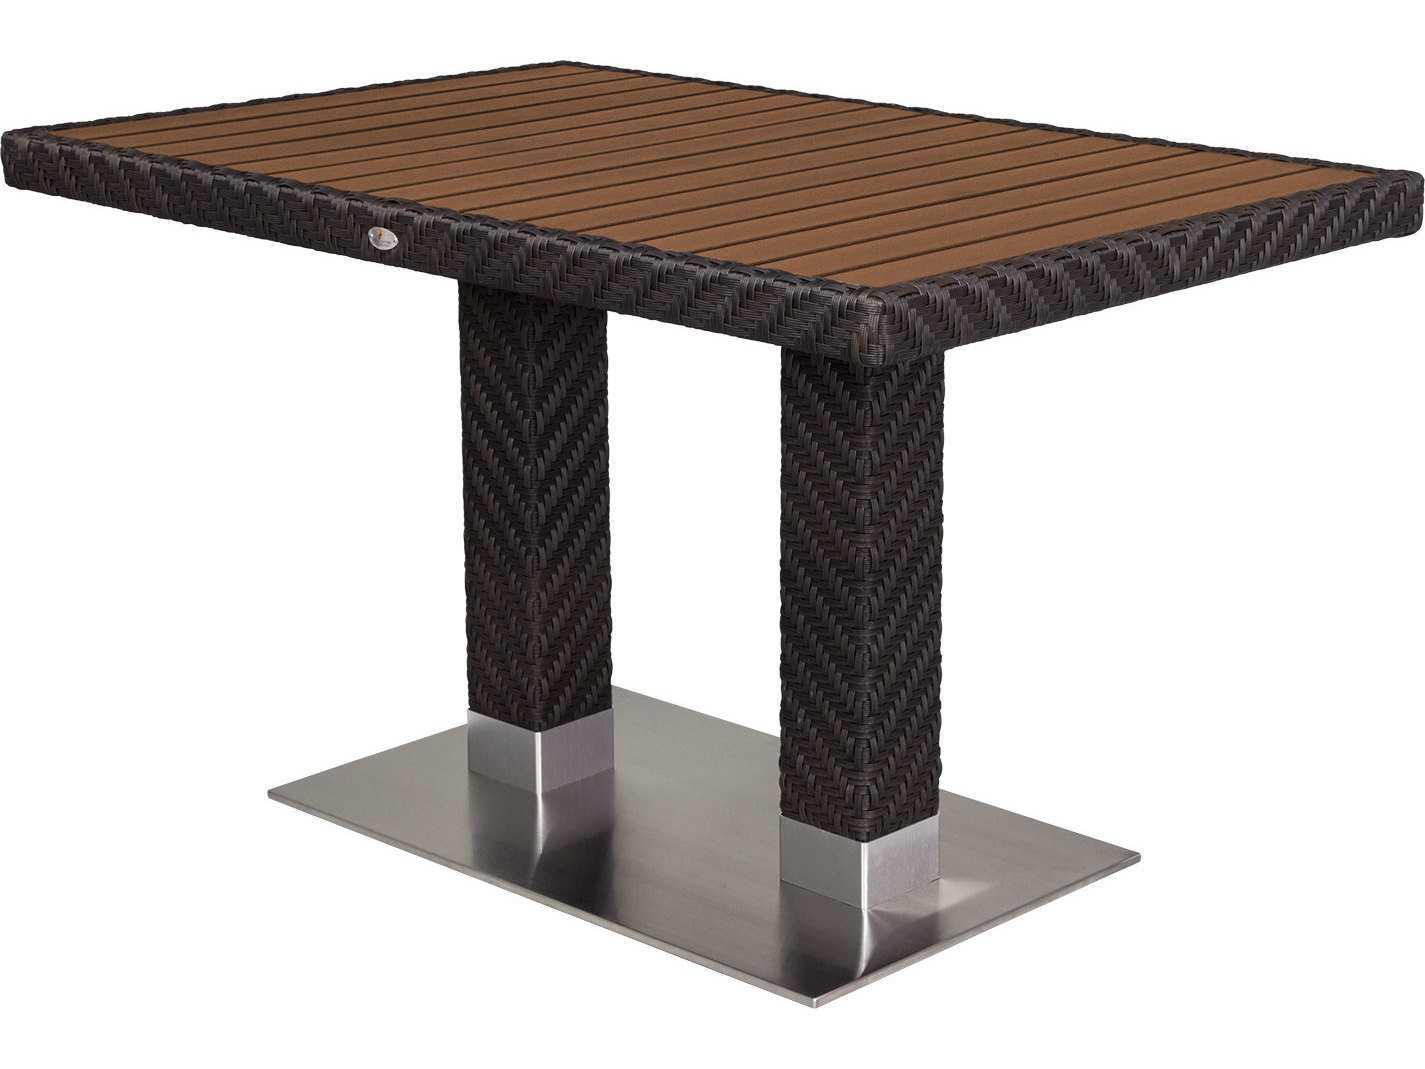 source outdoor furniture arizona wicker 48 x 32 rectangular dining table scsc2206314. Black Bedroom Furniture Sets. Home Design Ideas